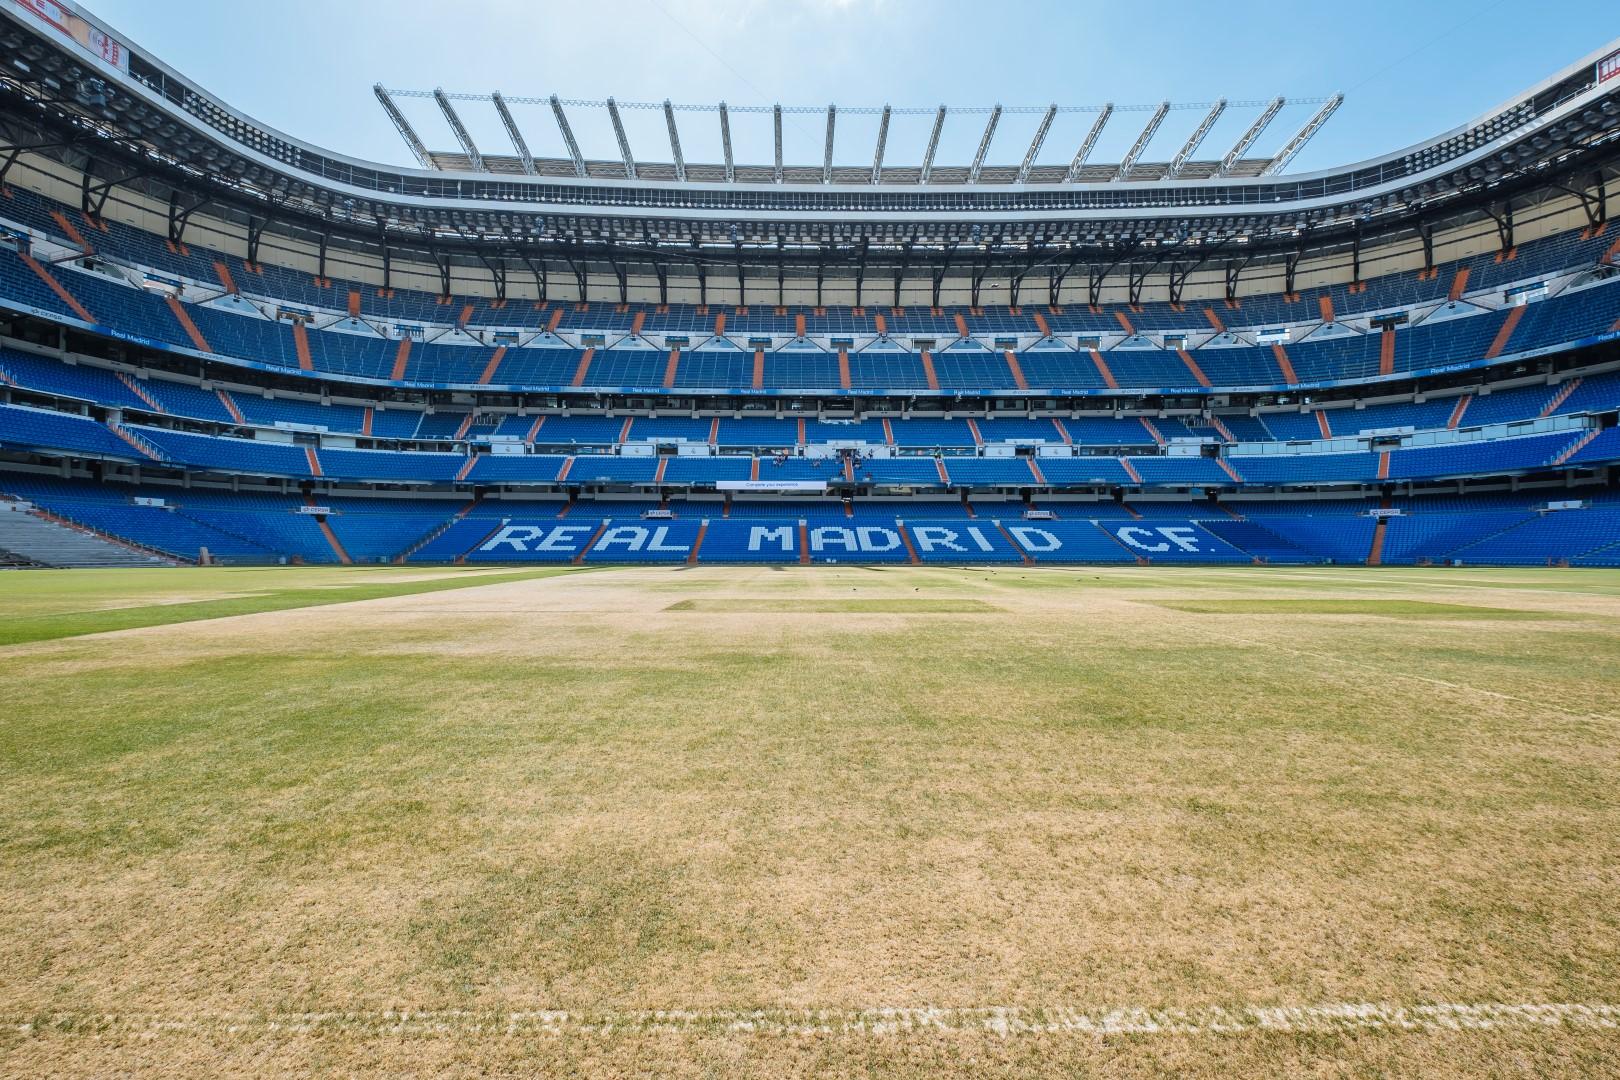 Real-Madrid_03.jpg